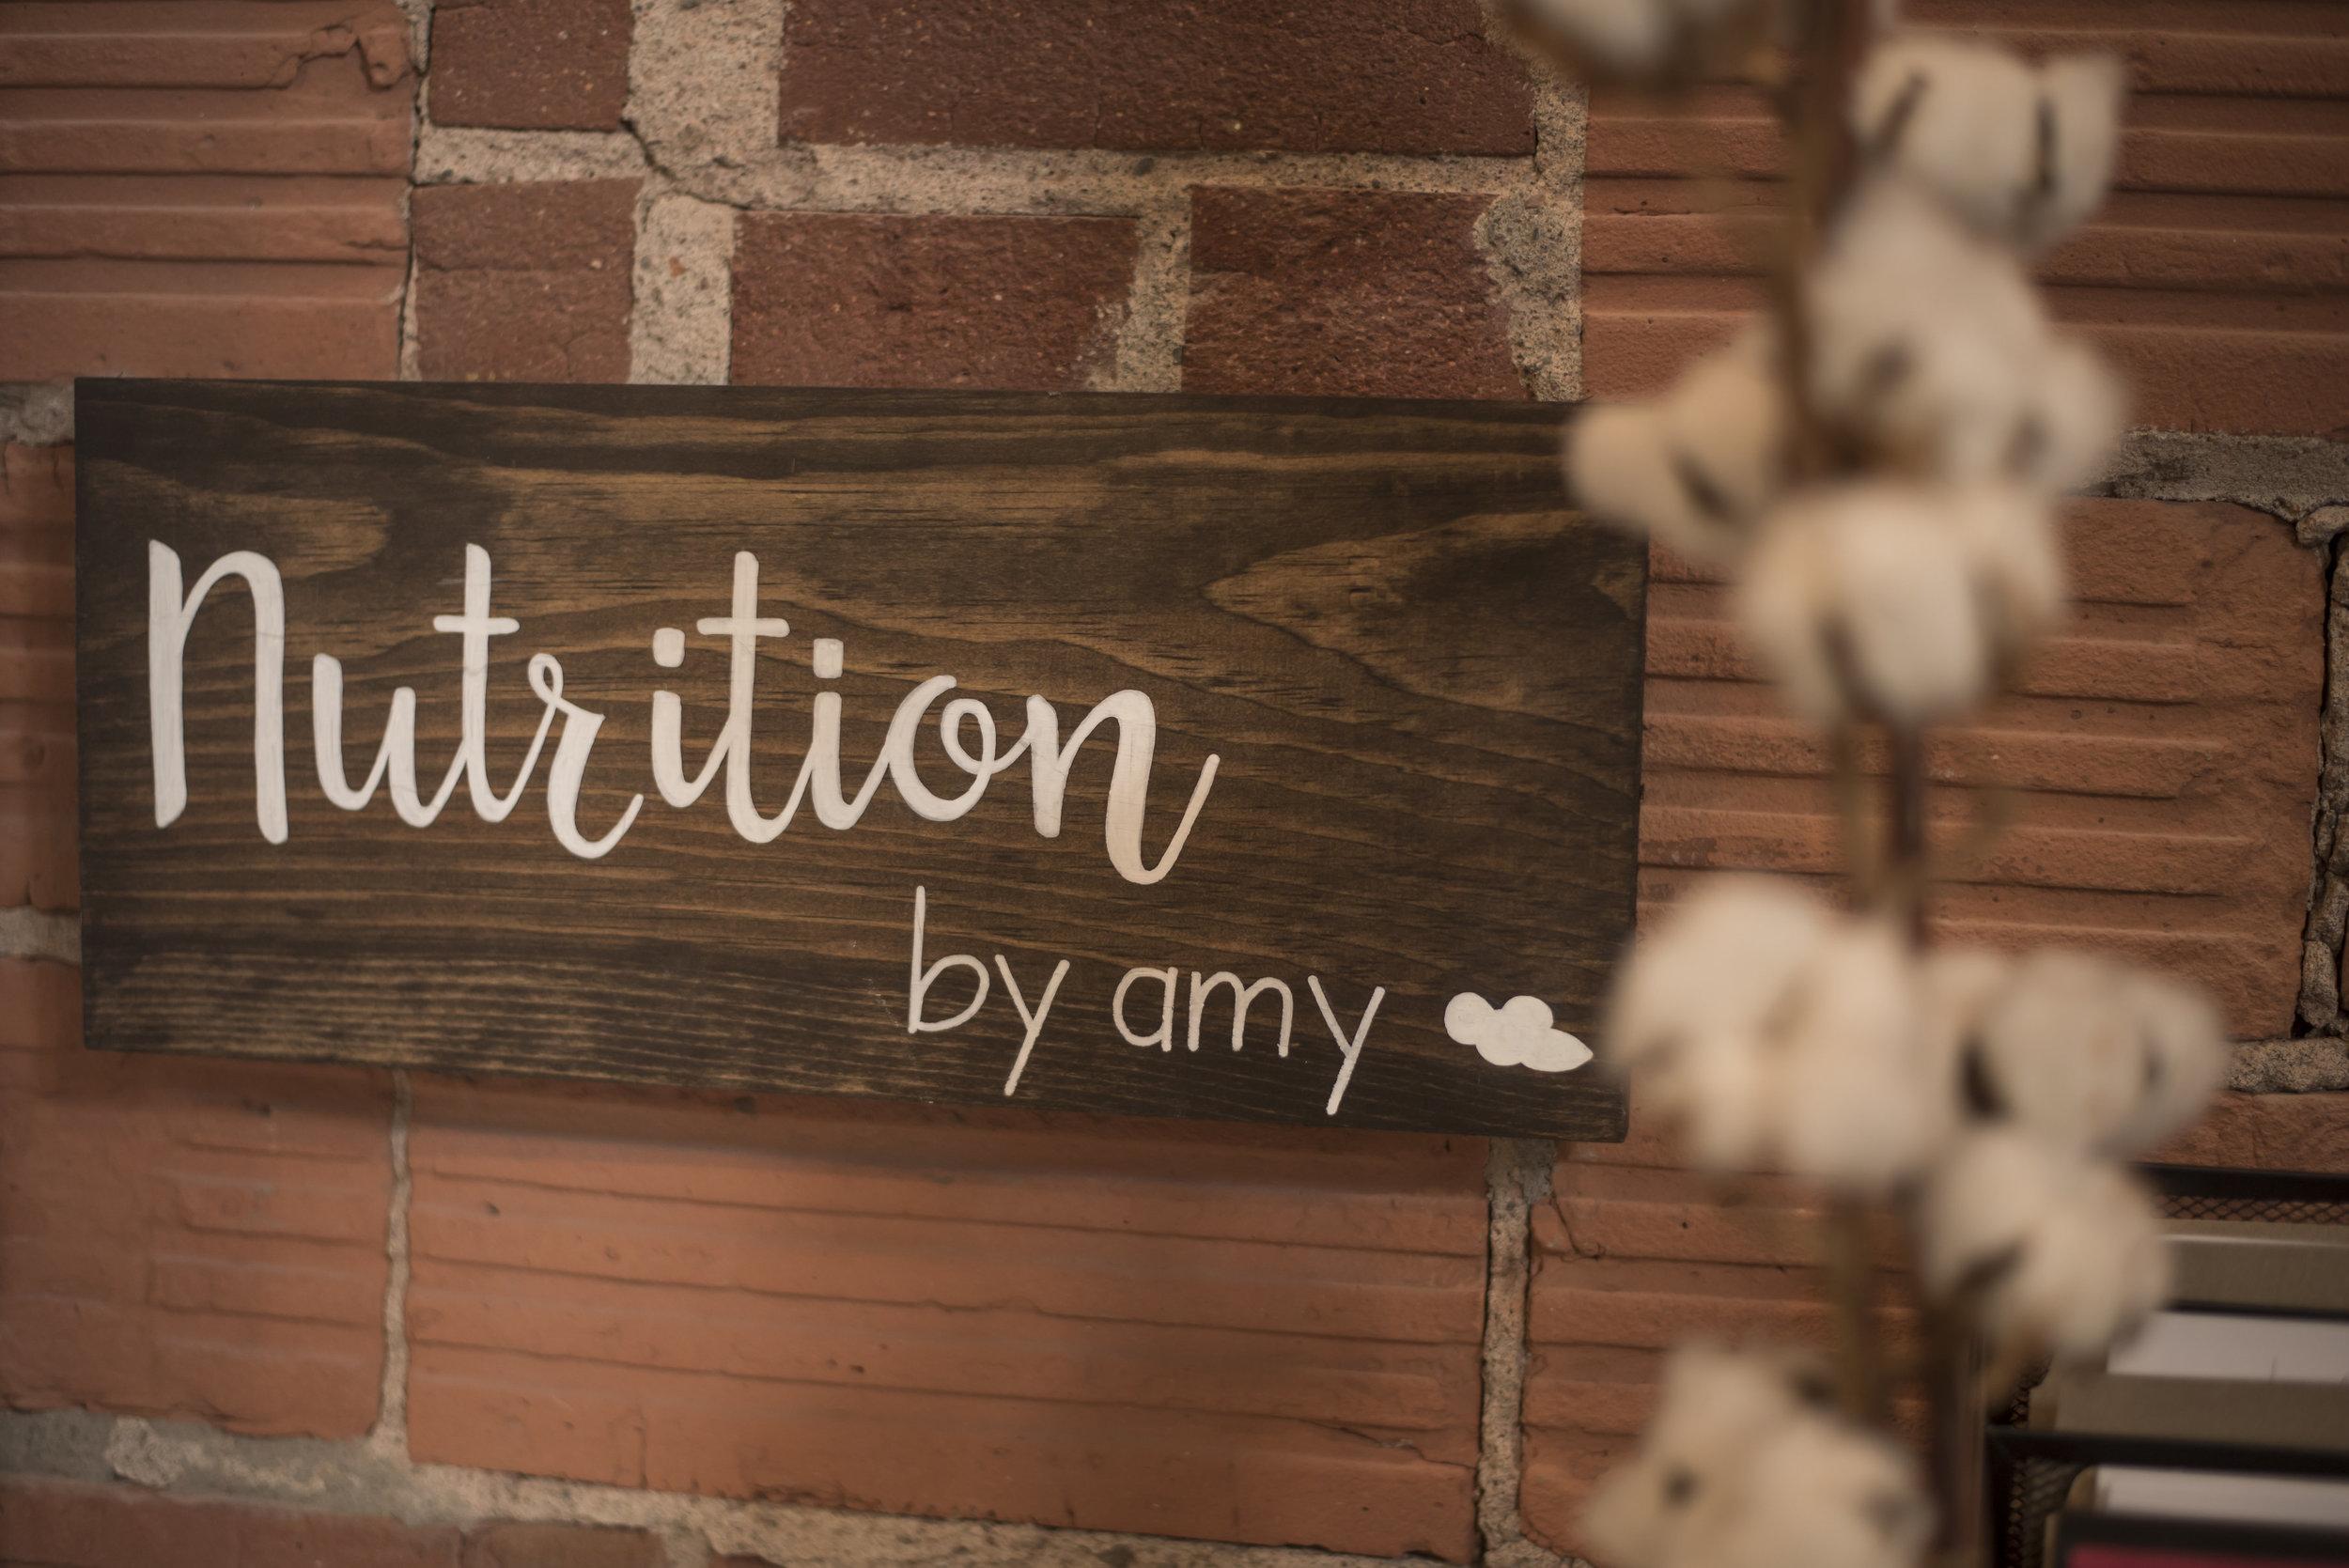 NutritionByAmy_DanGarrityMedia_TheVault_37.jpg